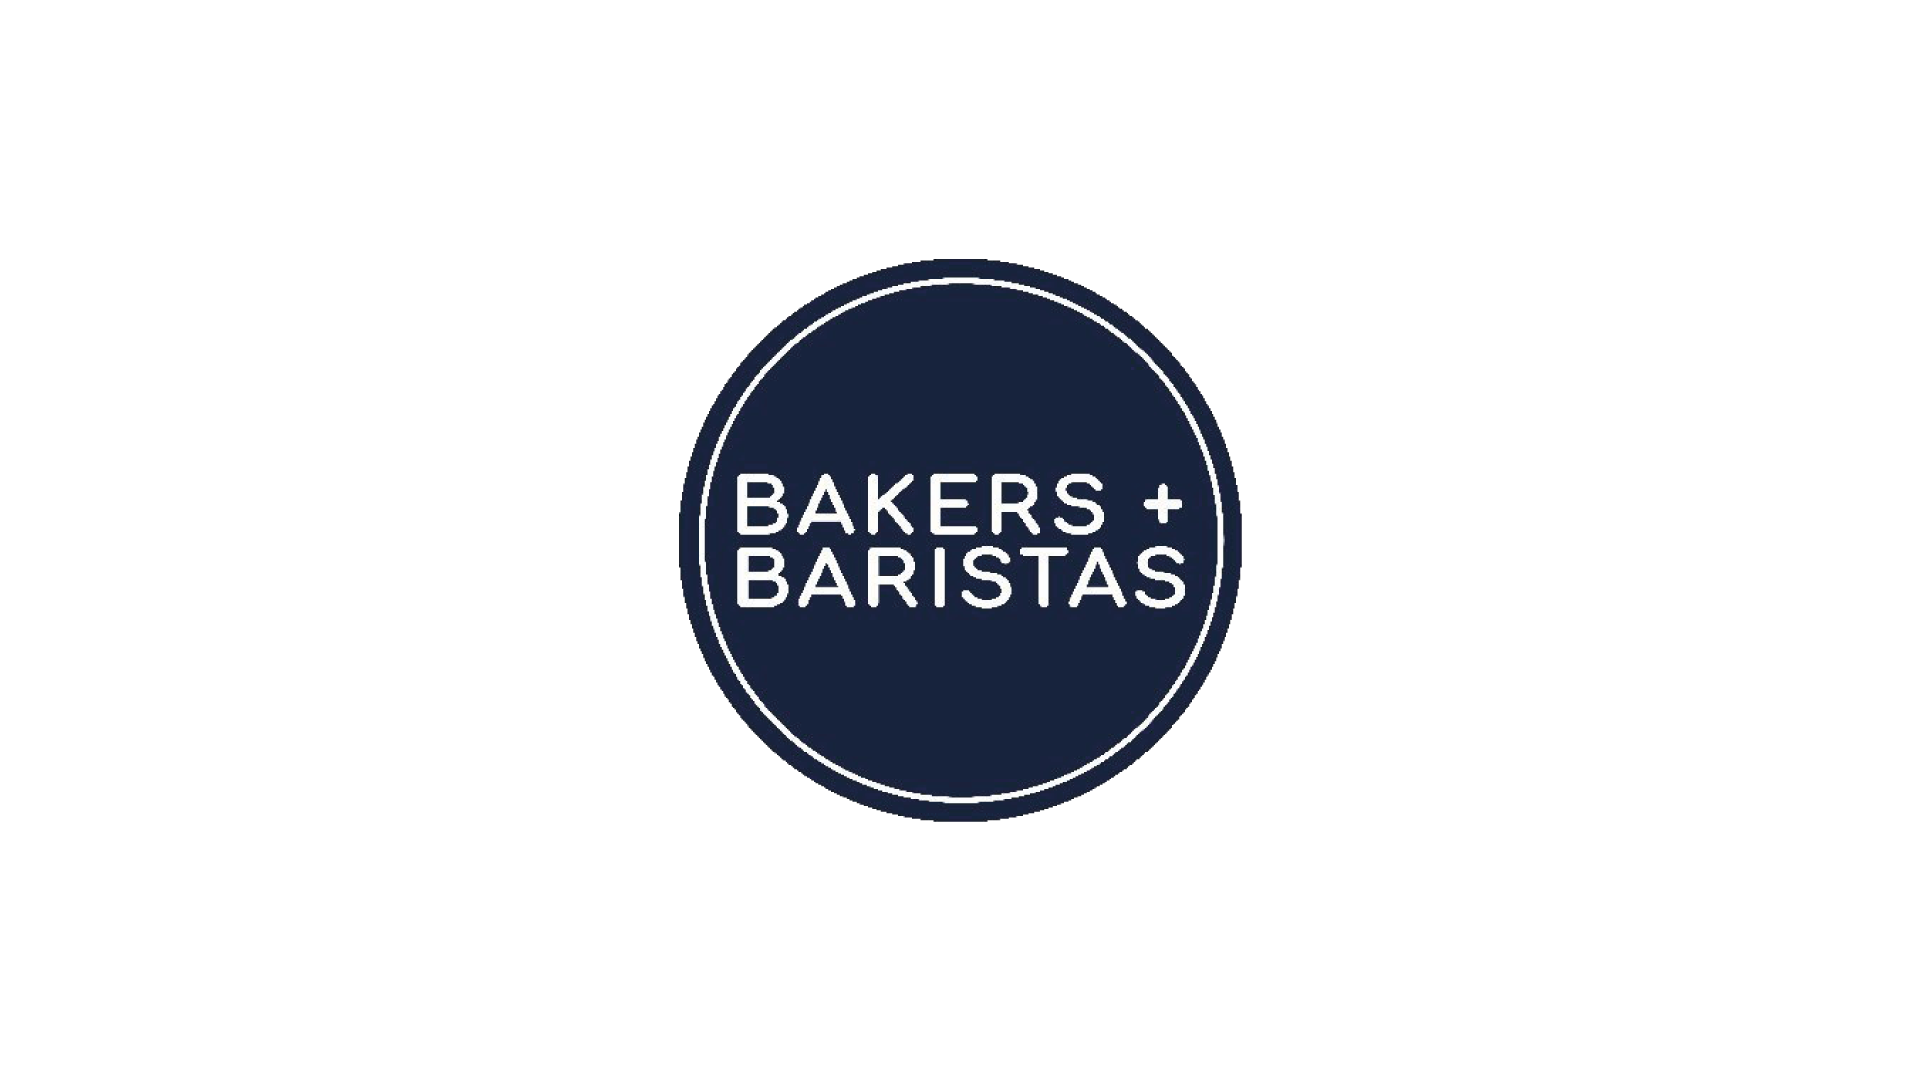 CADS Client Bakers + Baristas